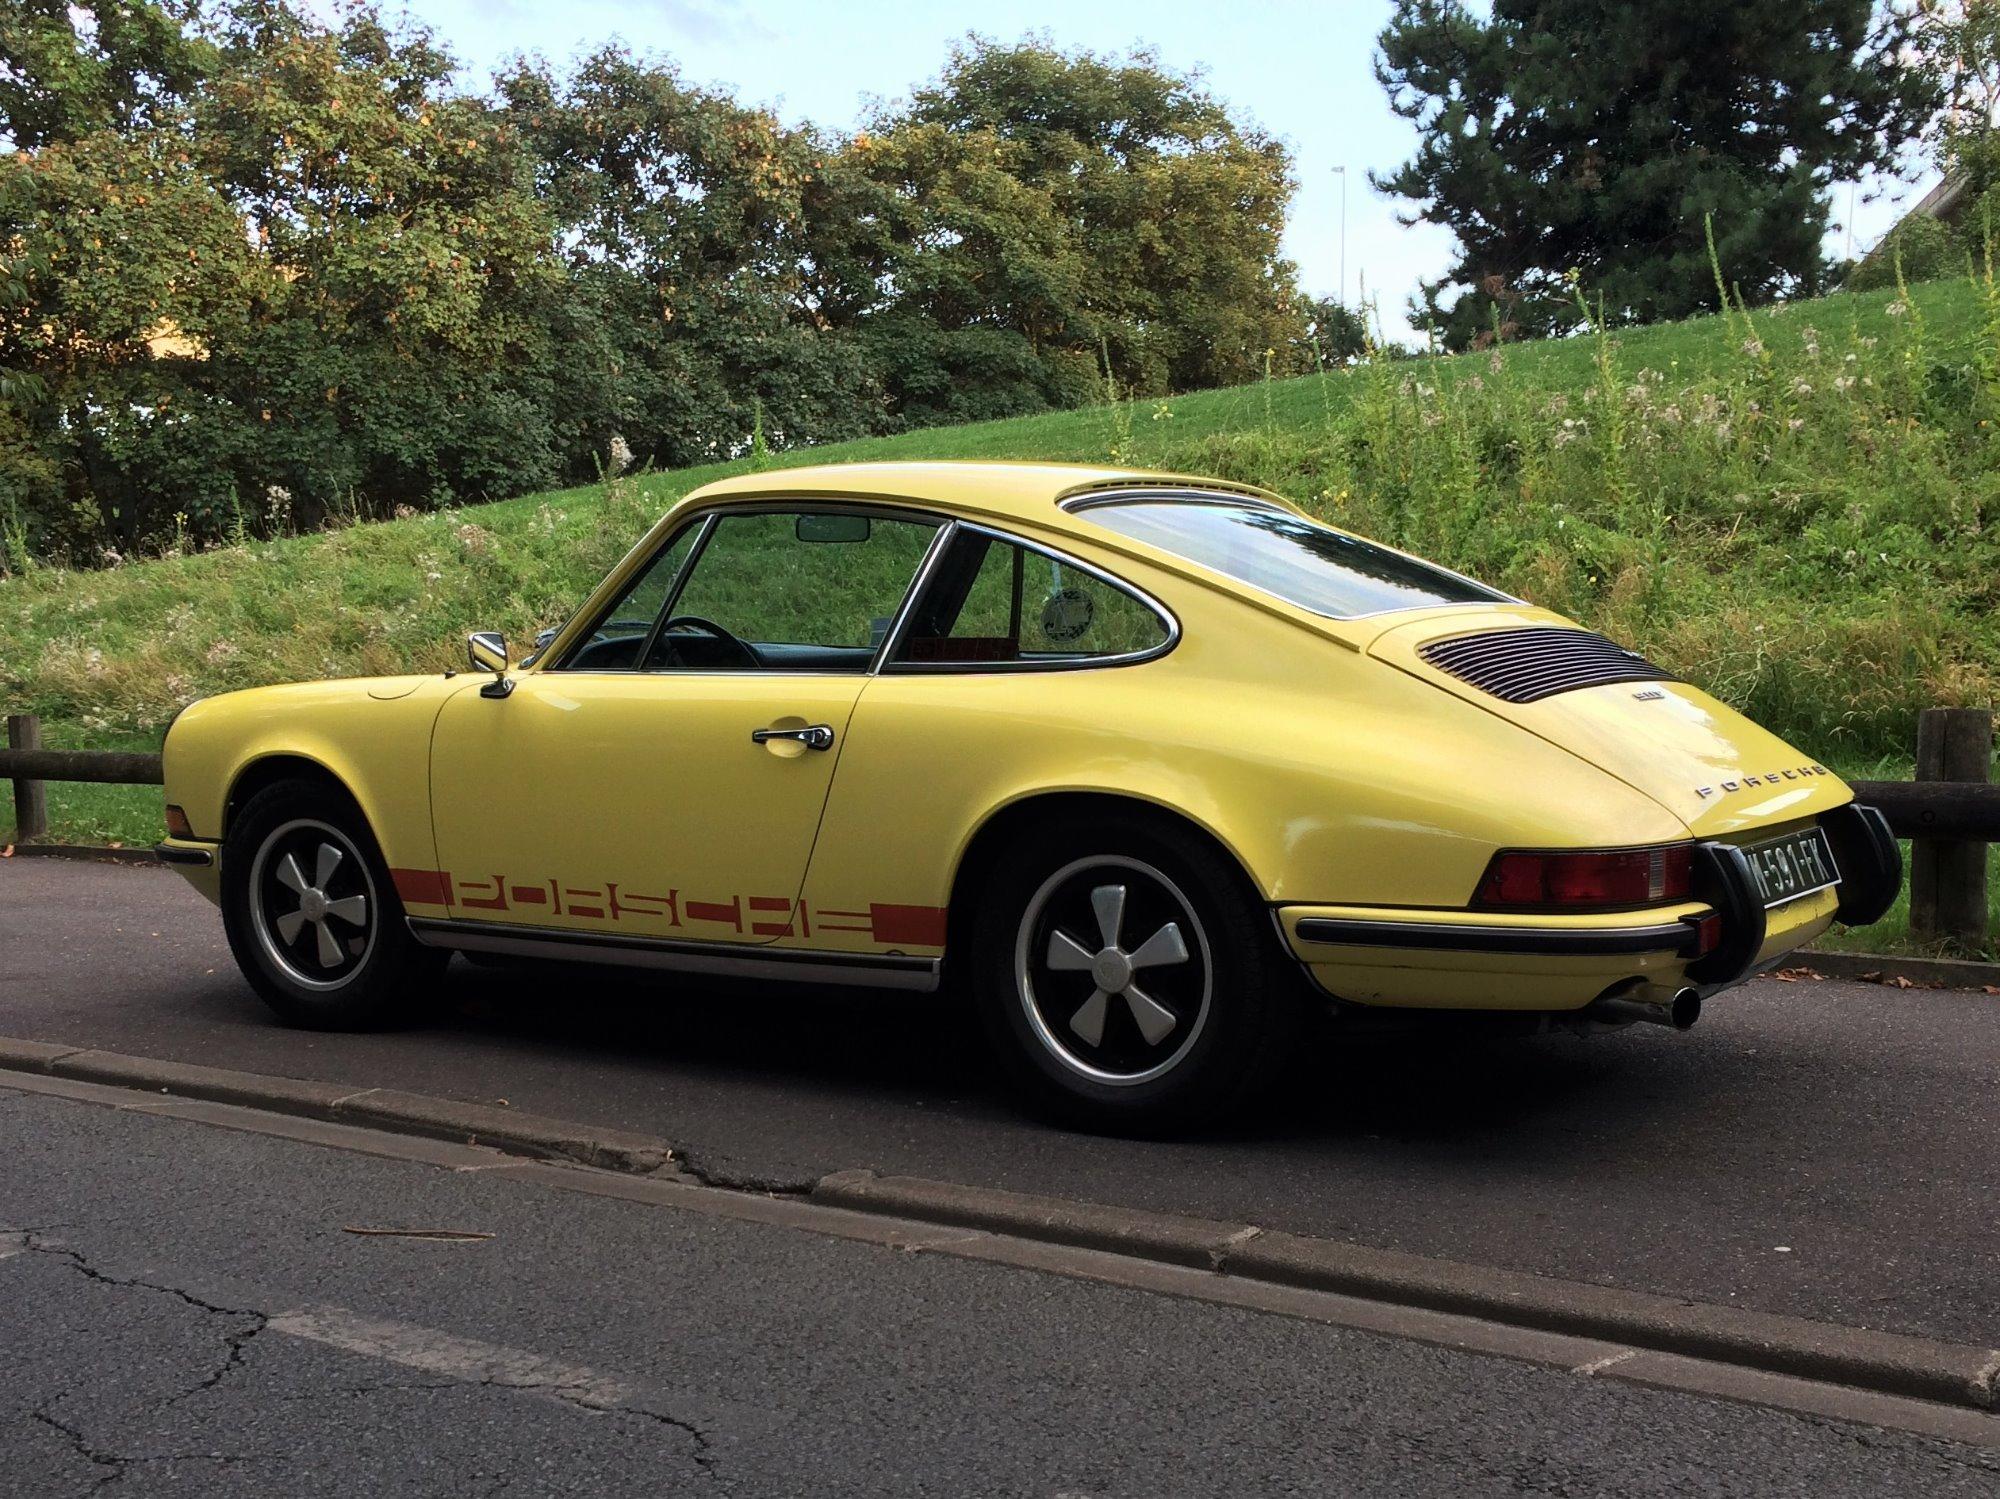 Porsche9112.4TE197305371.JPG